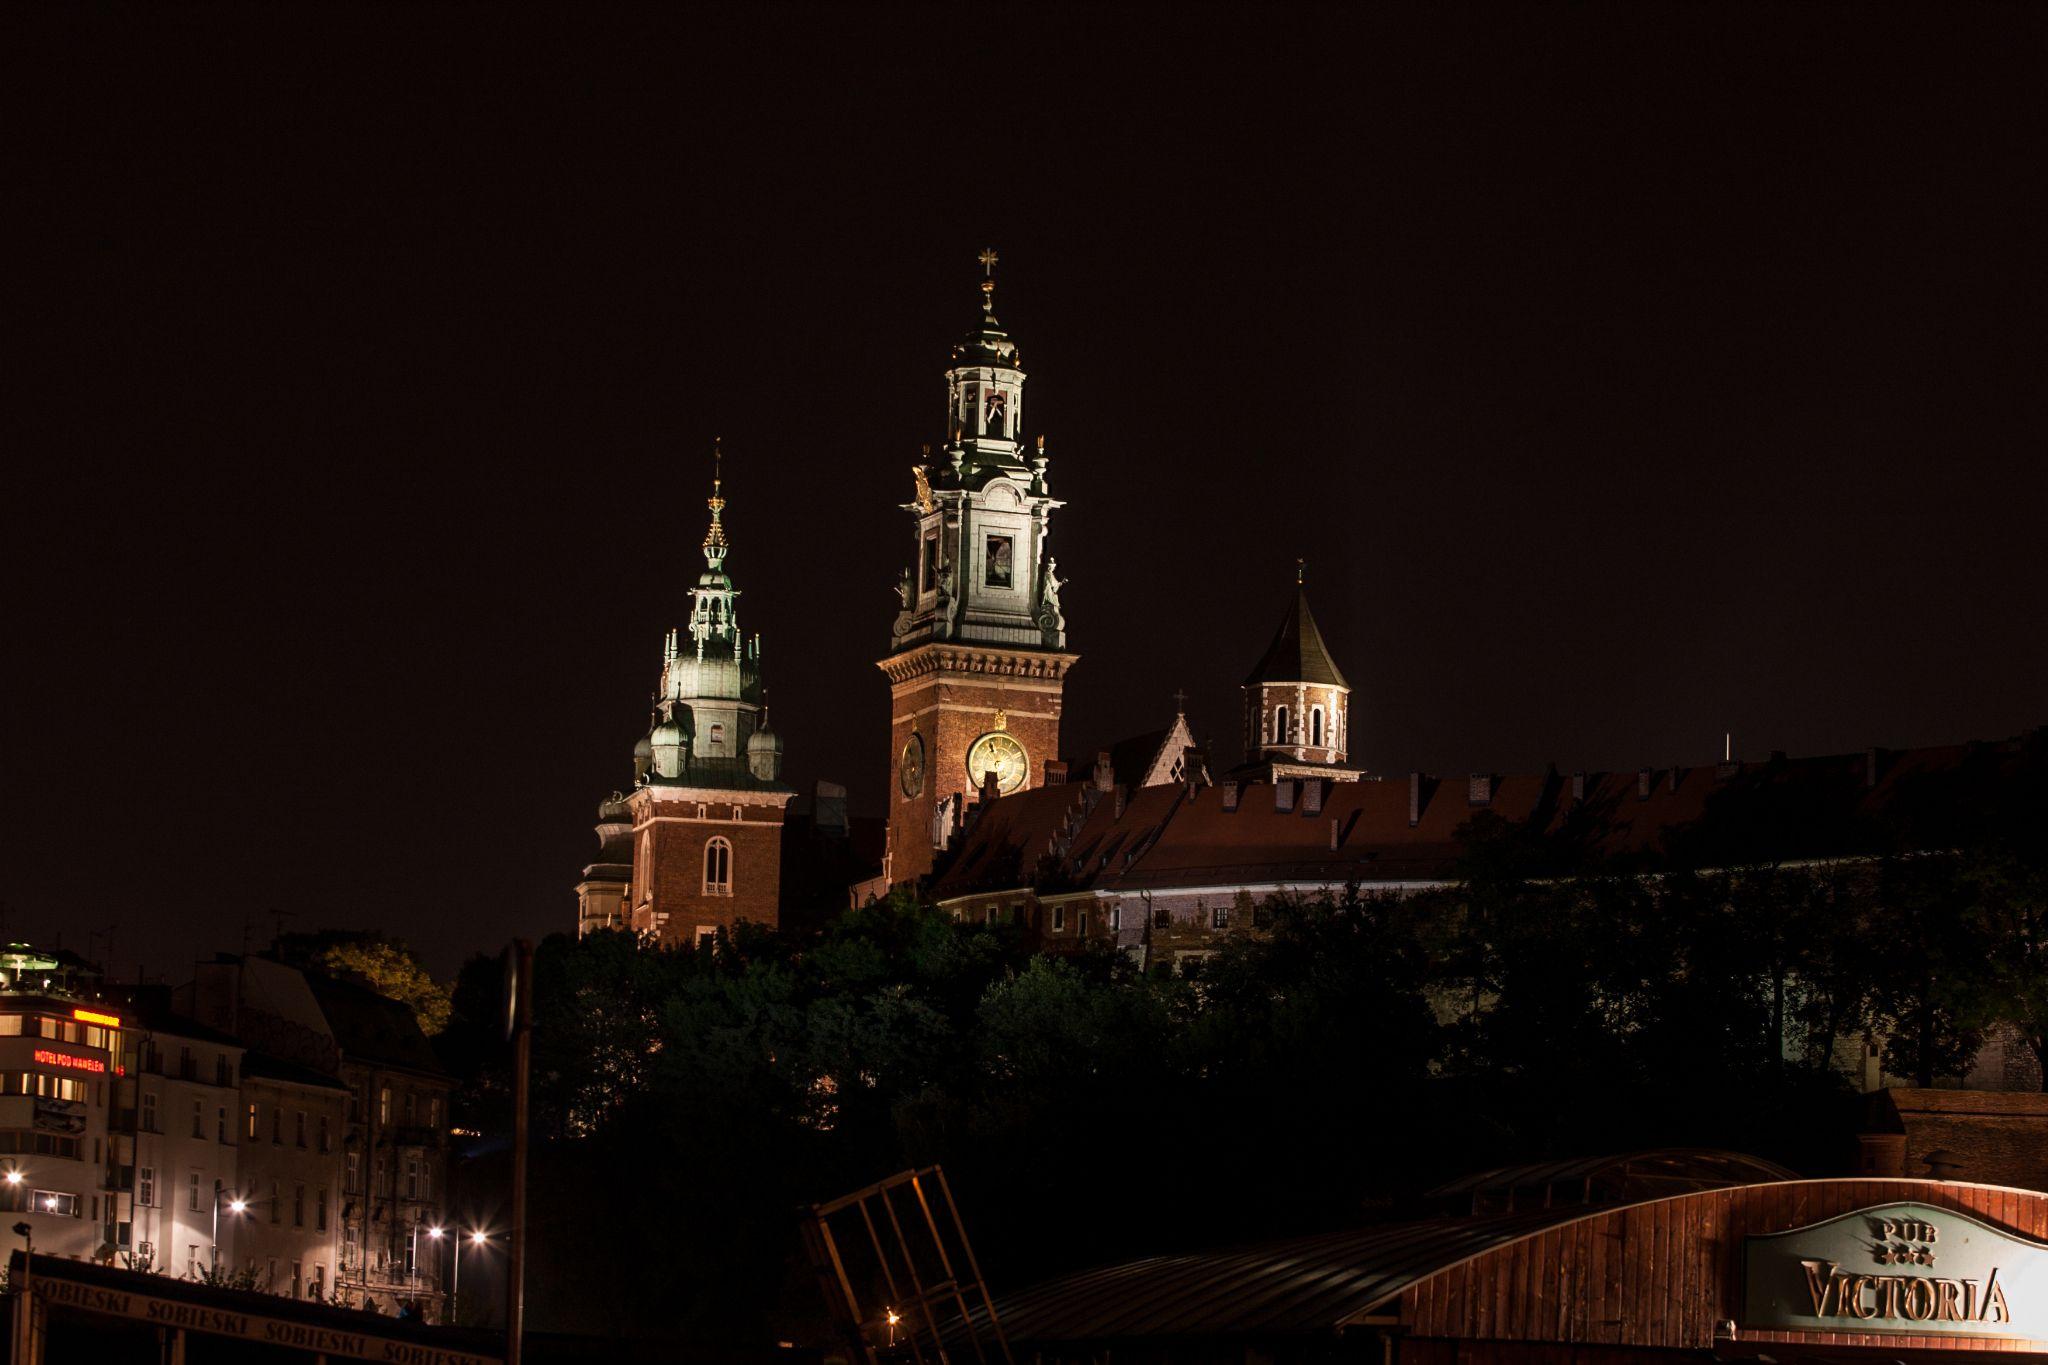 Krakow by night by Koatl Photography